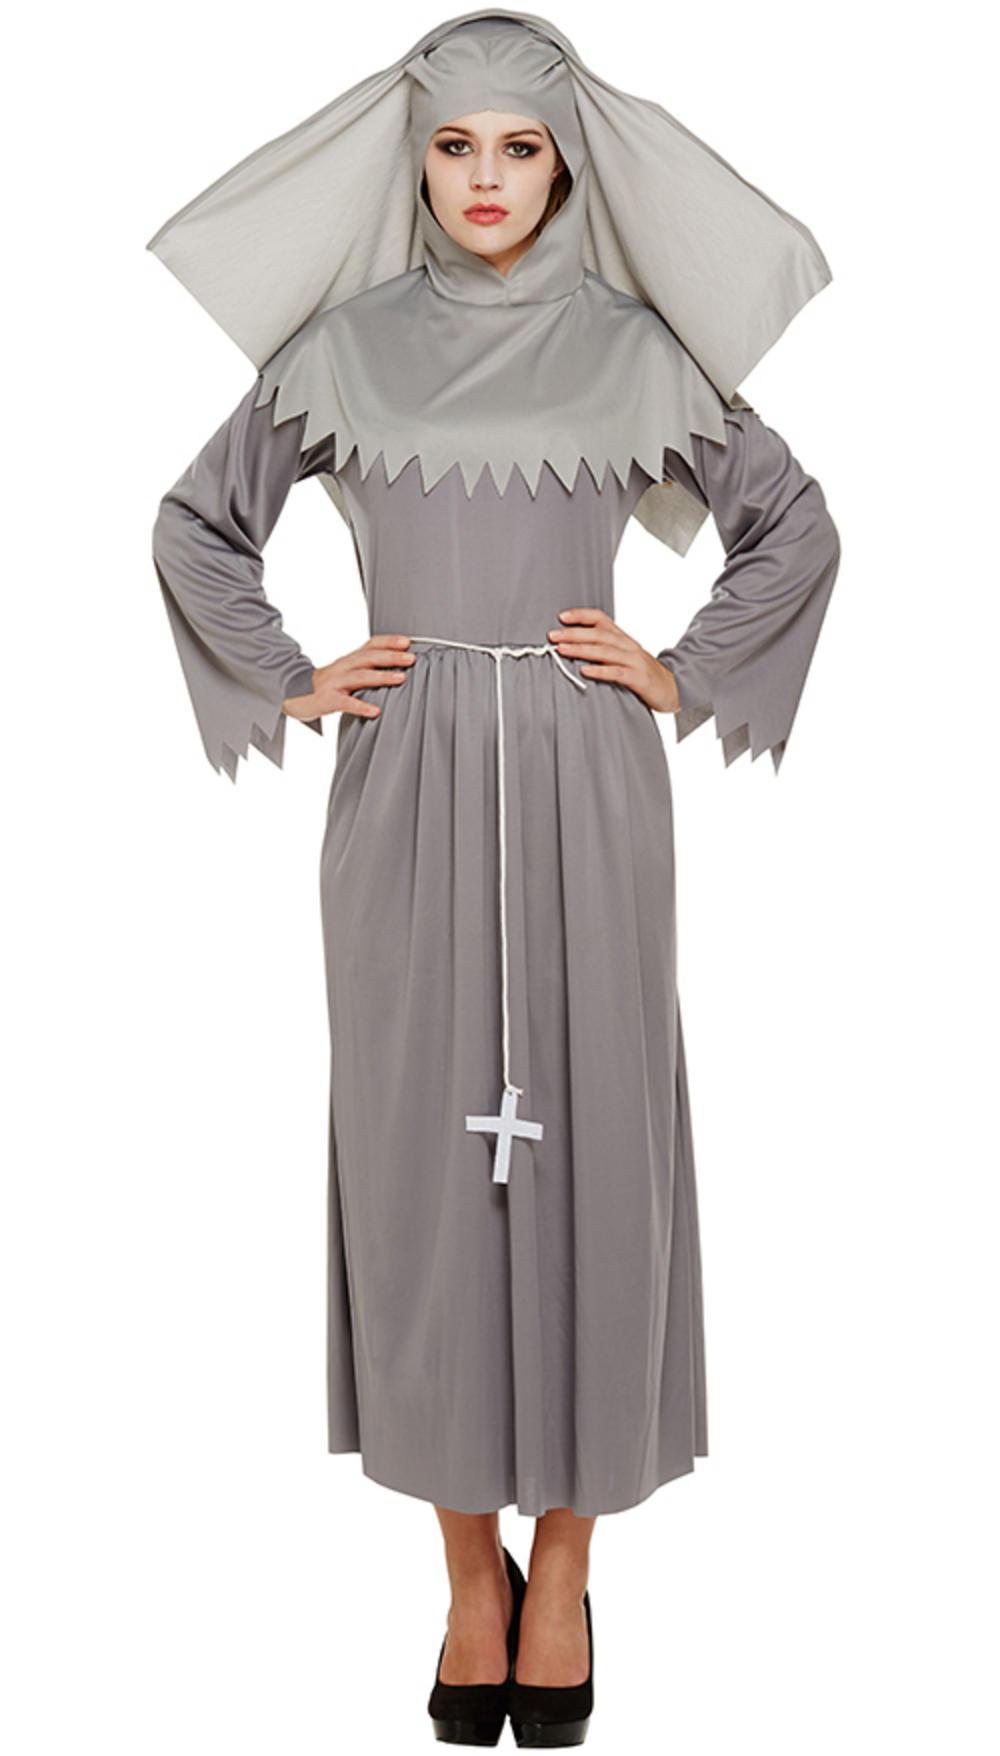 Spirit Ghost Nun Costume